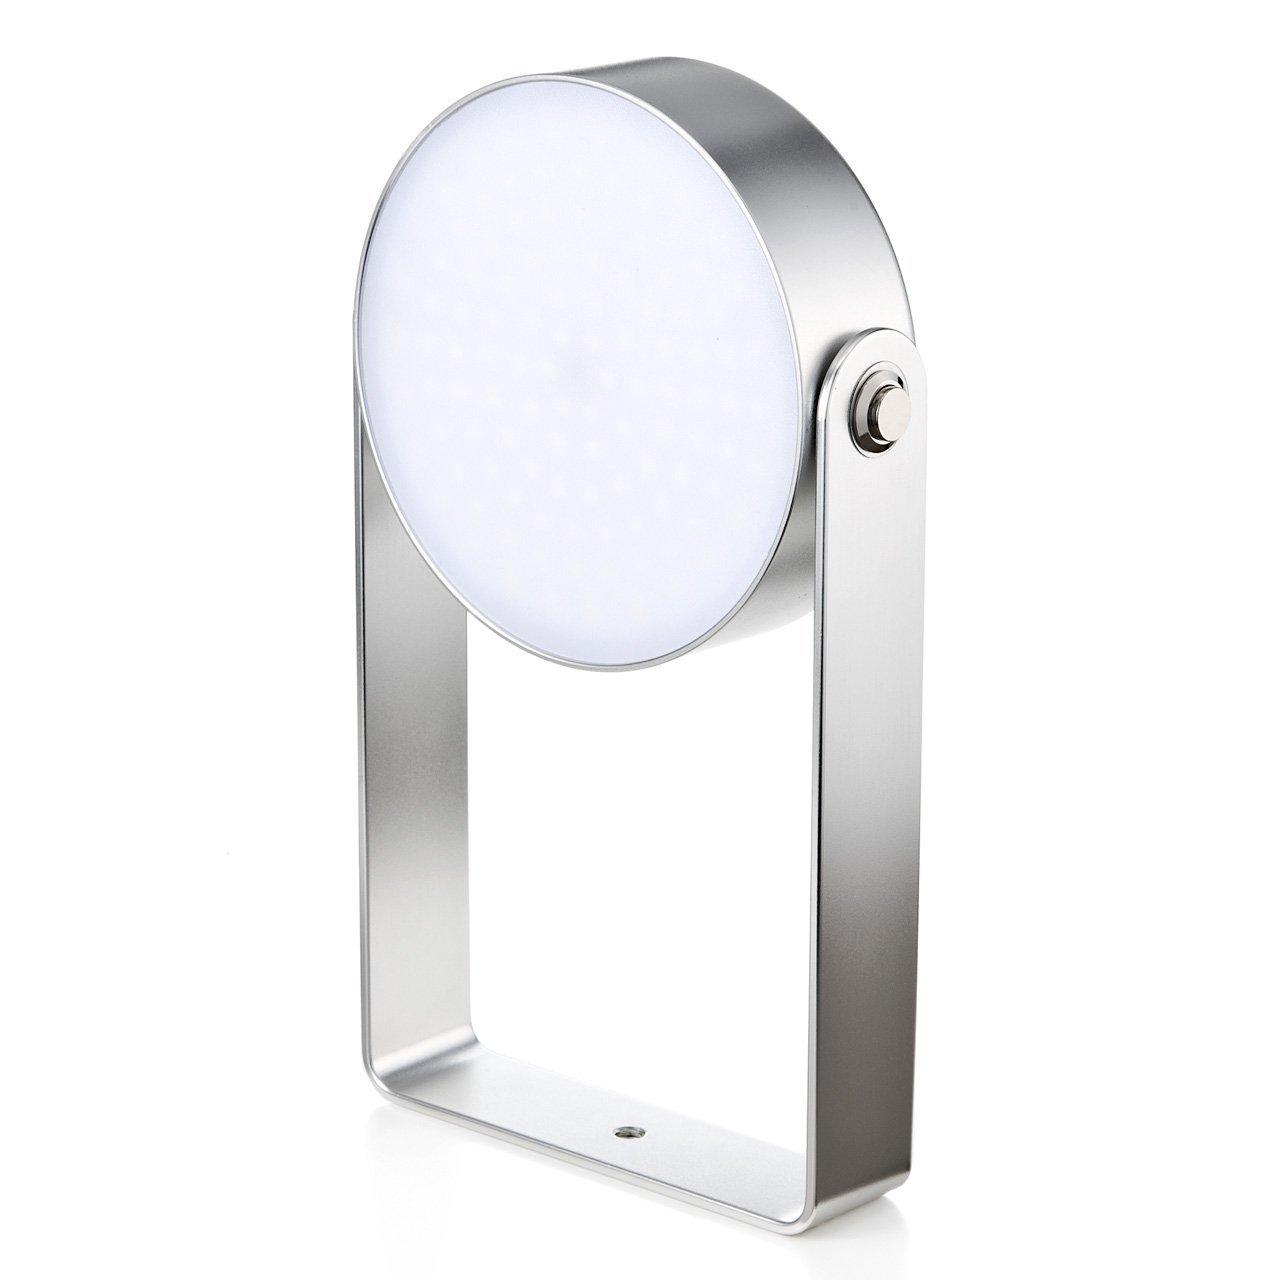 SANWA Direct Wasserdicht LED Light 720 Lumen USB Akku Kapazität 7800 mA